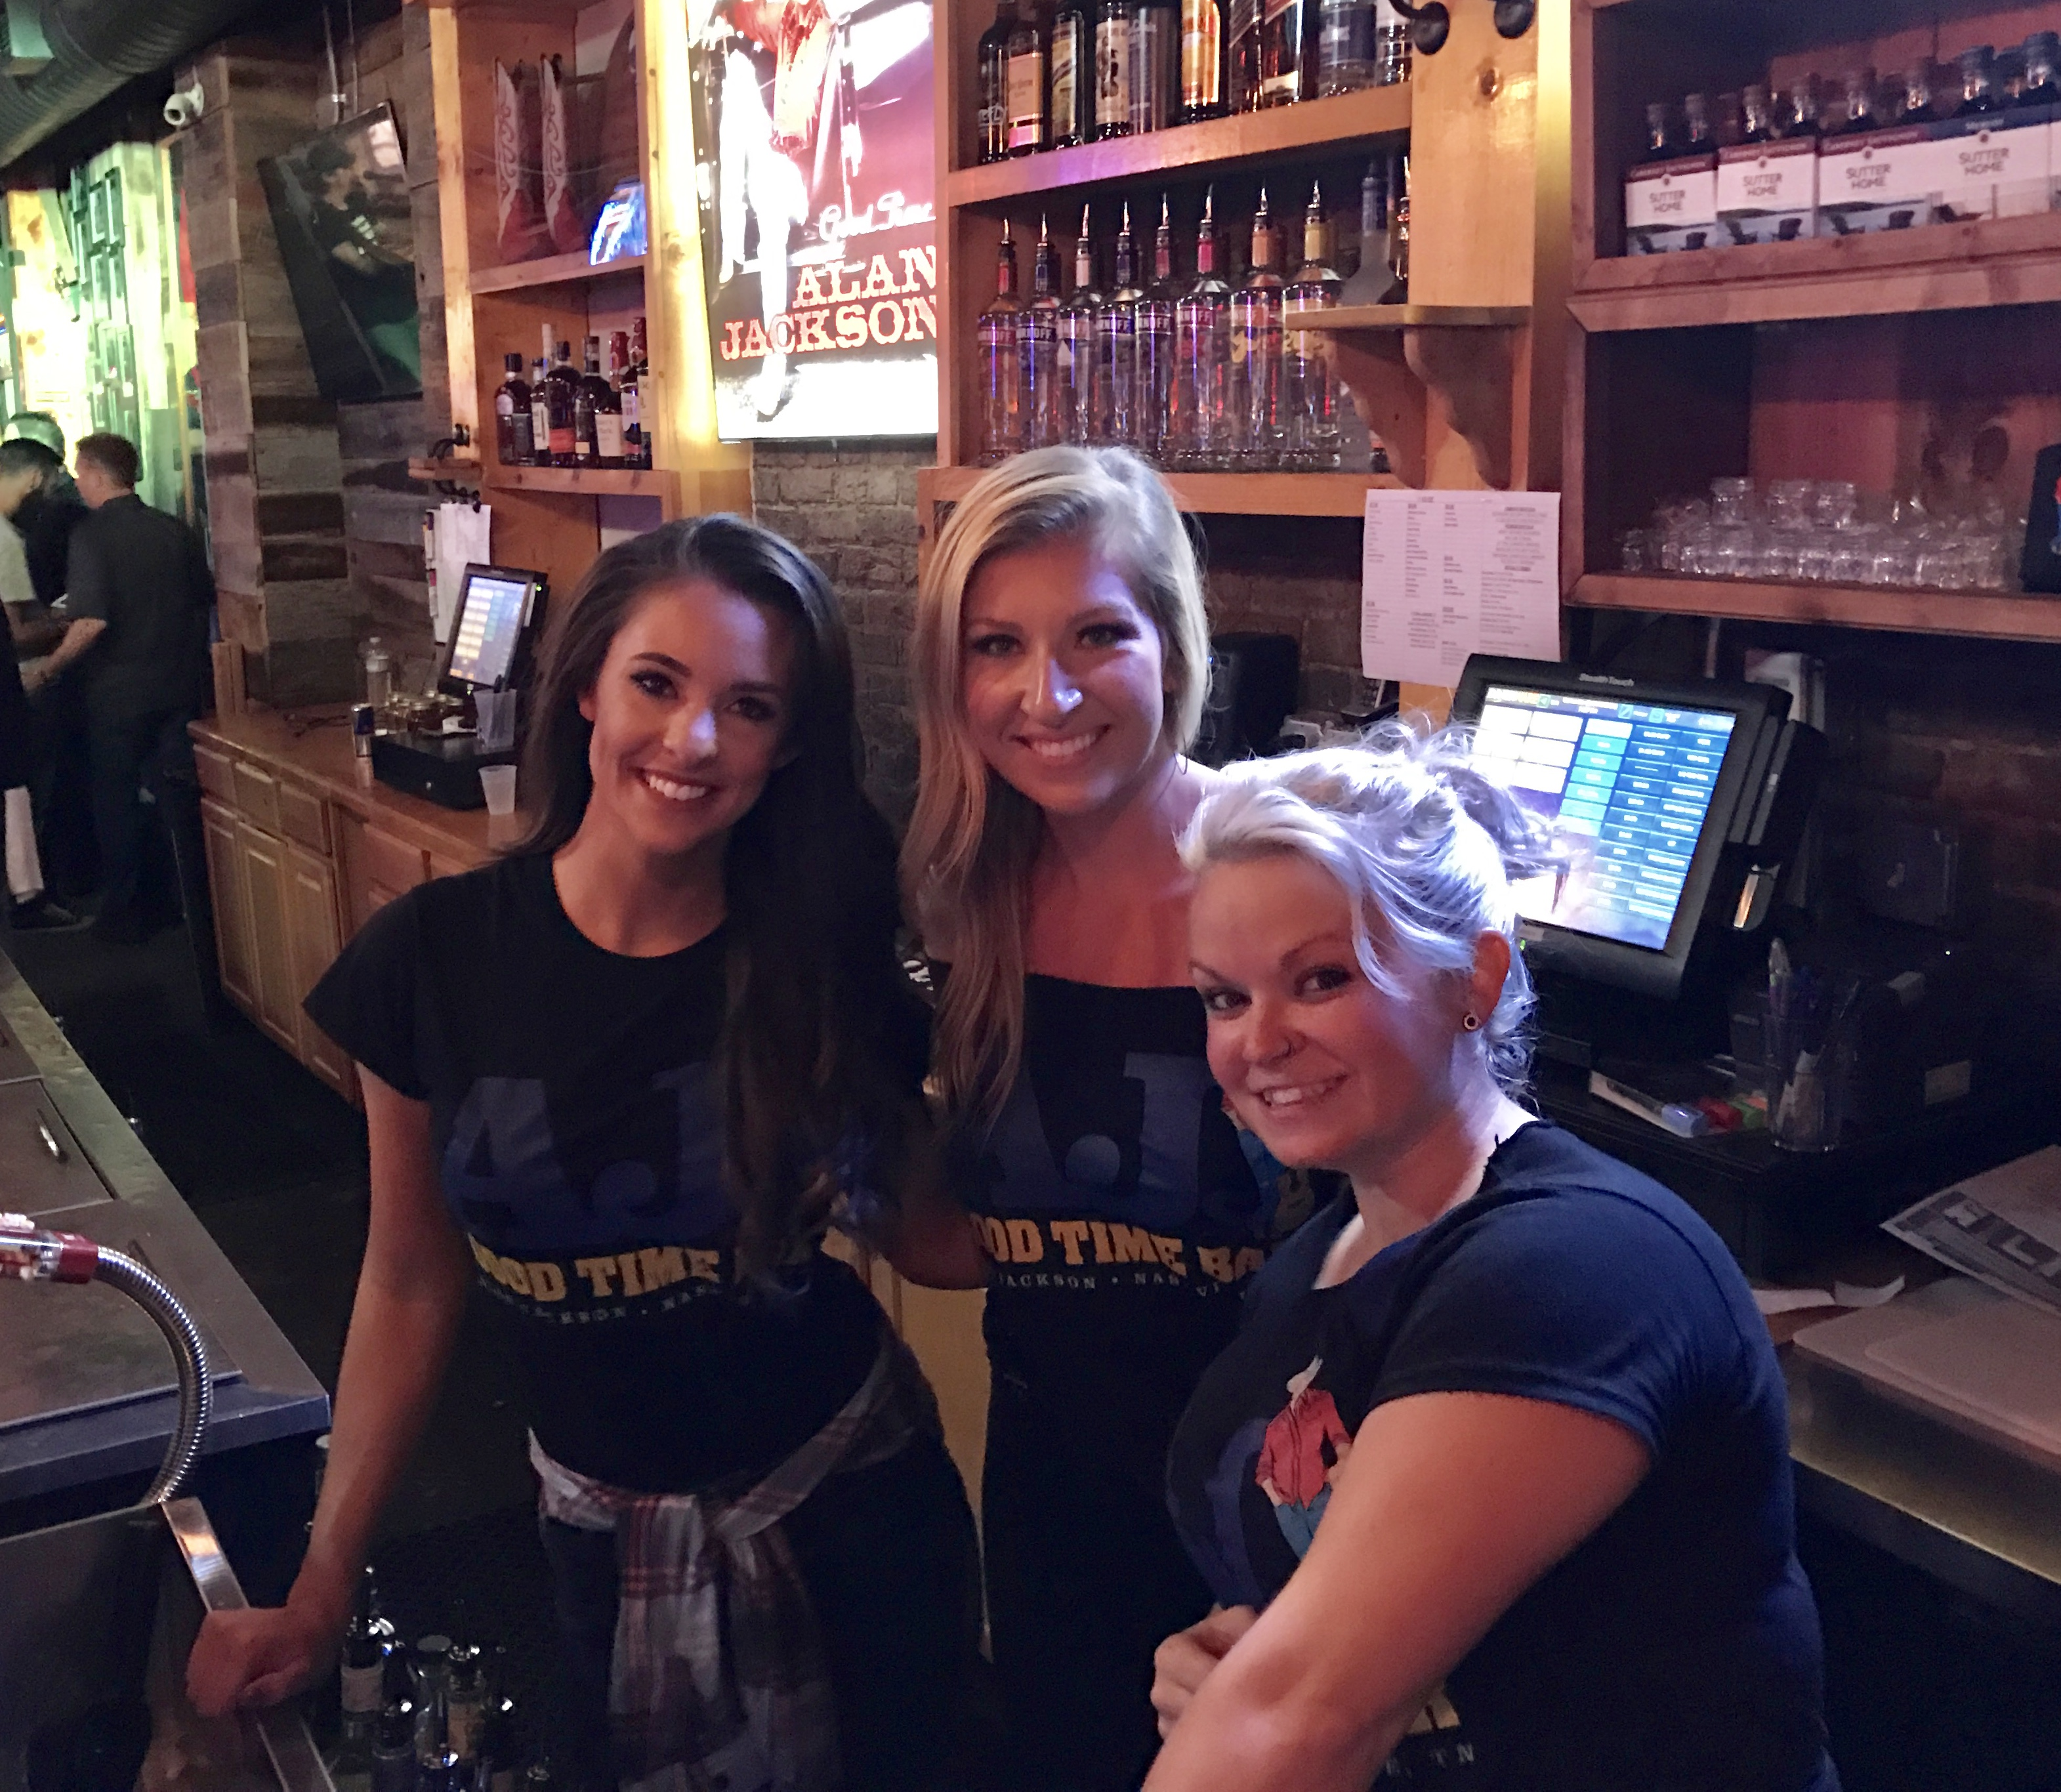 Opening Night At AJ's Good Time Bar